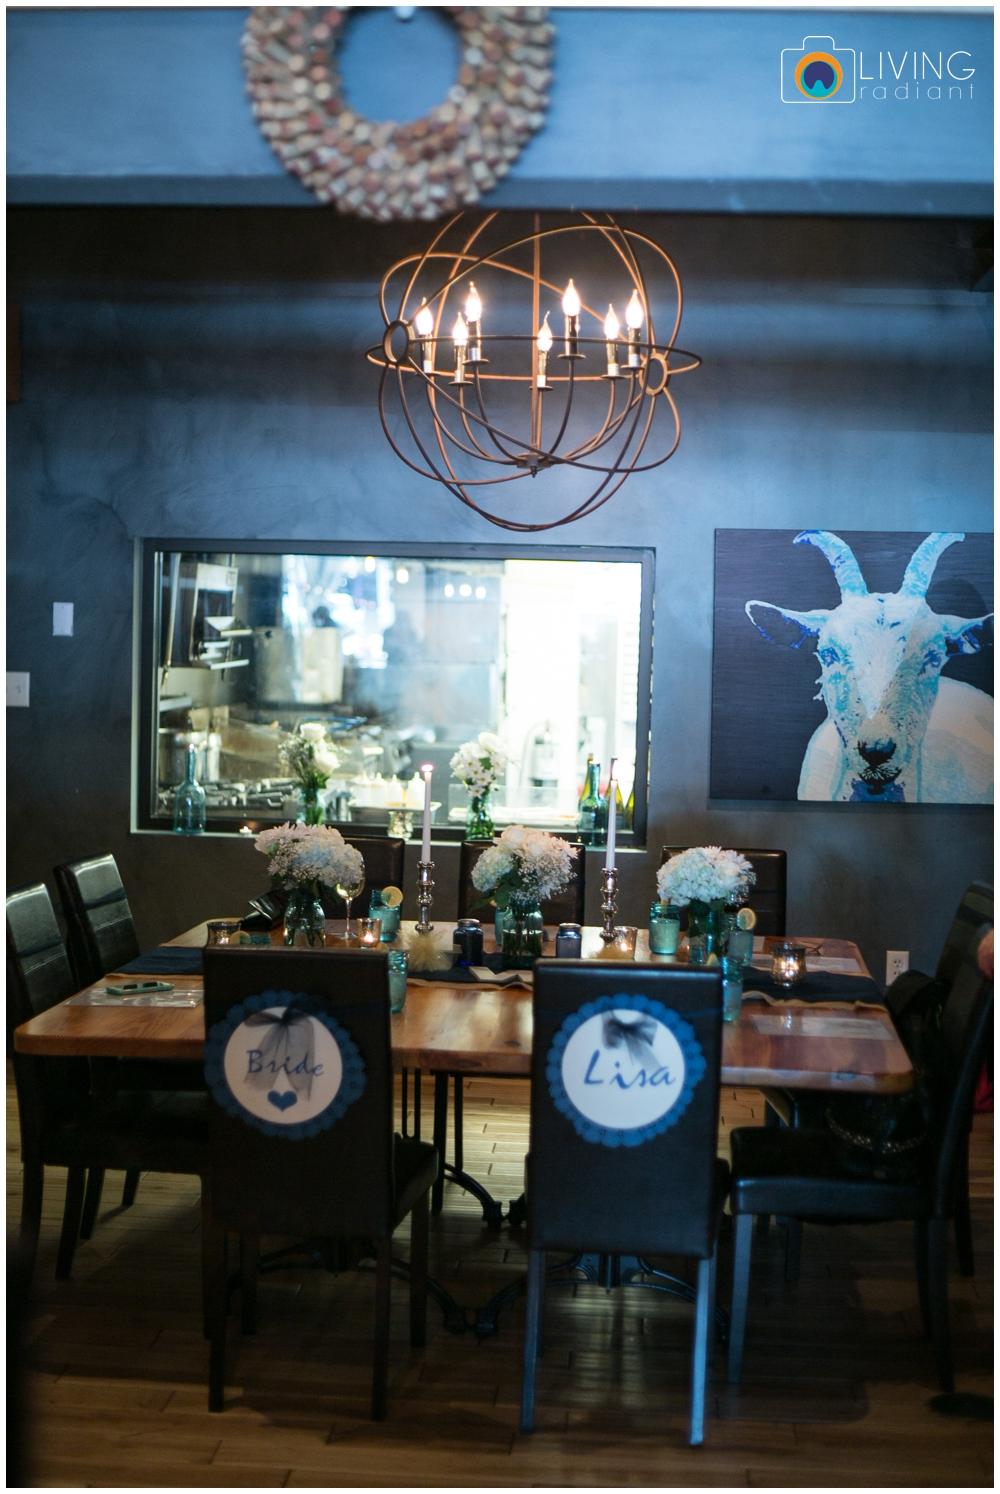 krissys-bridesmaid-luncheon-the-blue-goat-richmond-virginia-living-radiant-photography_0012.jpg